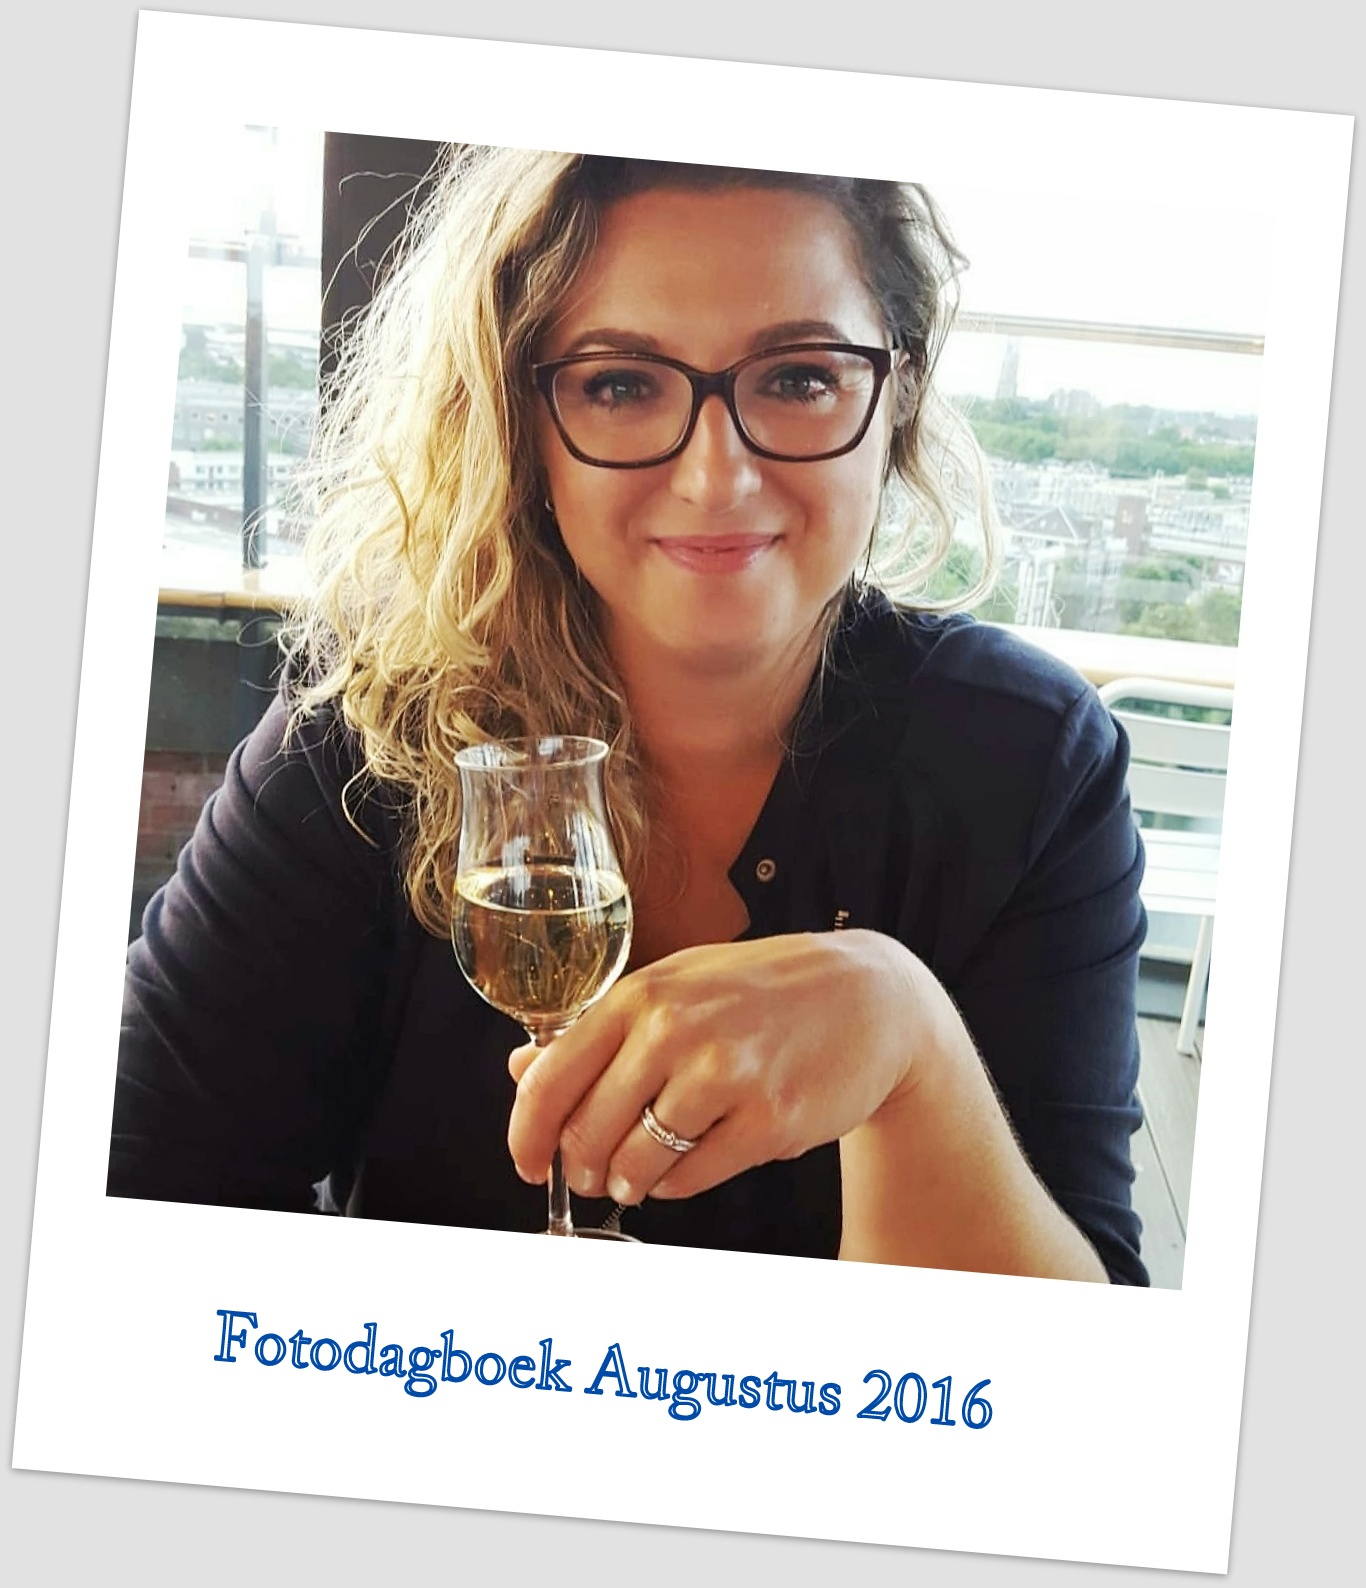 Fotodagboek Augustus 2016